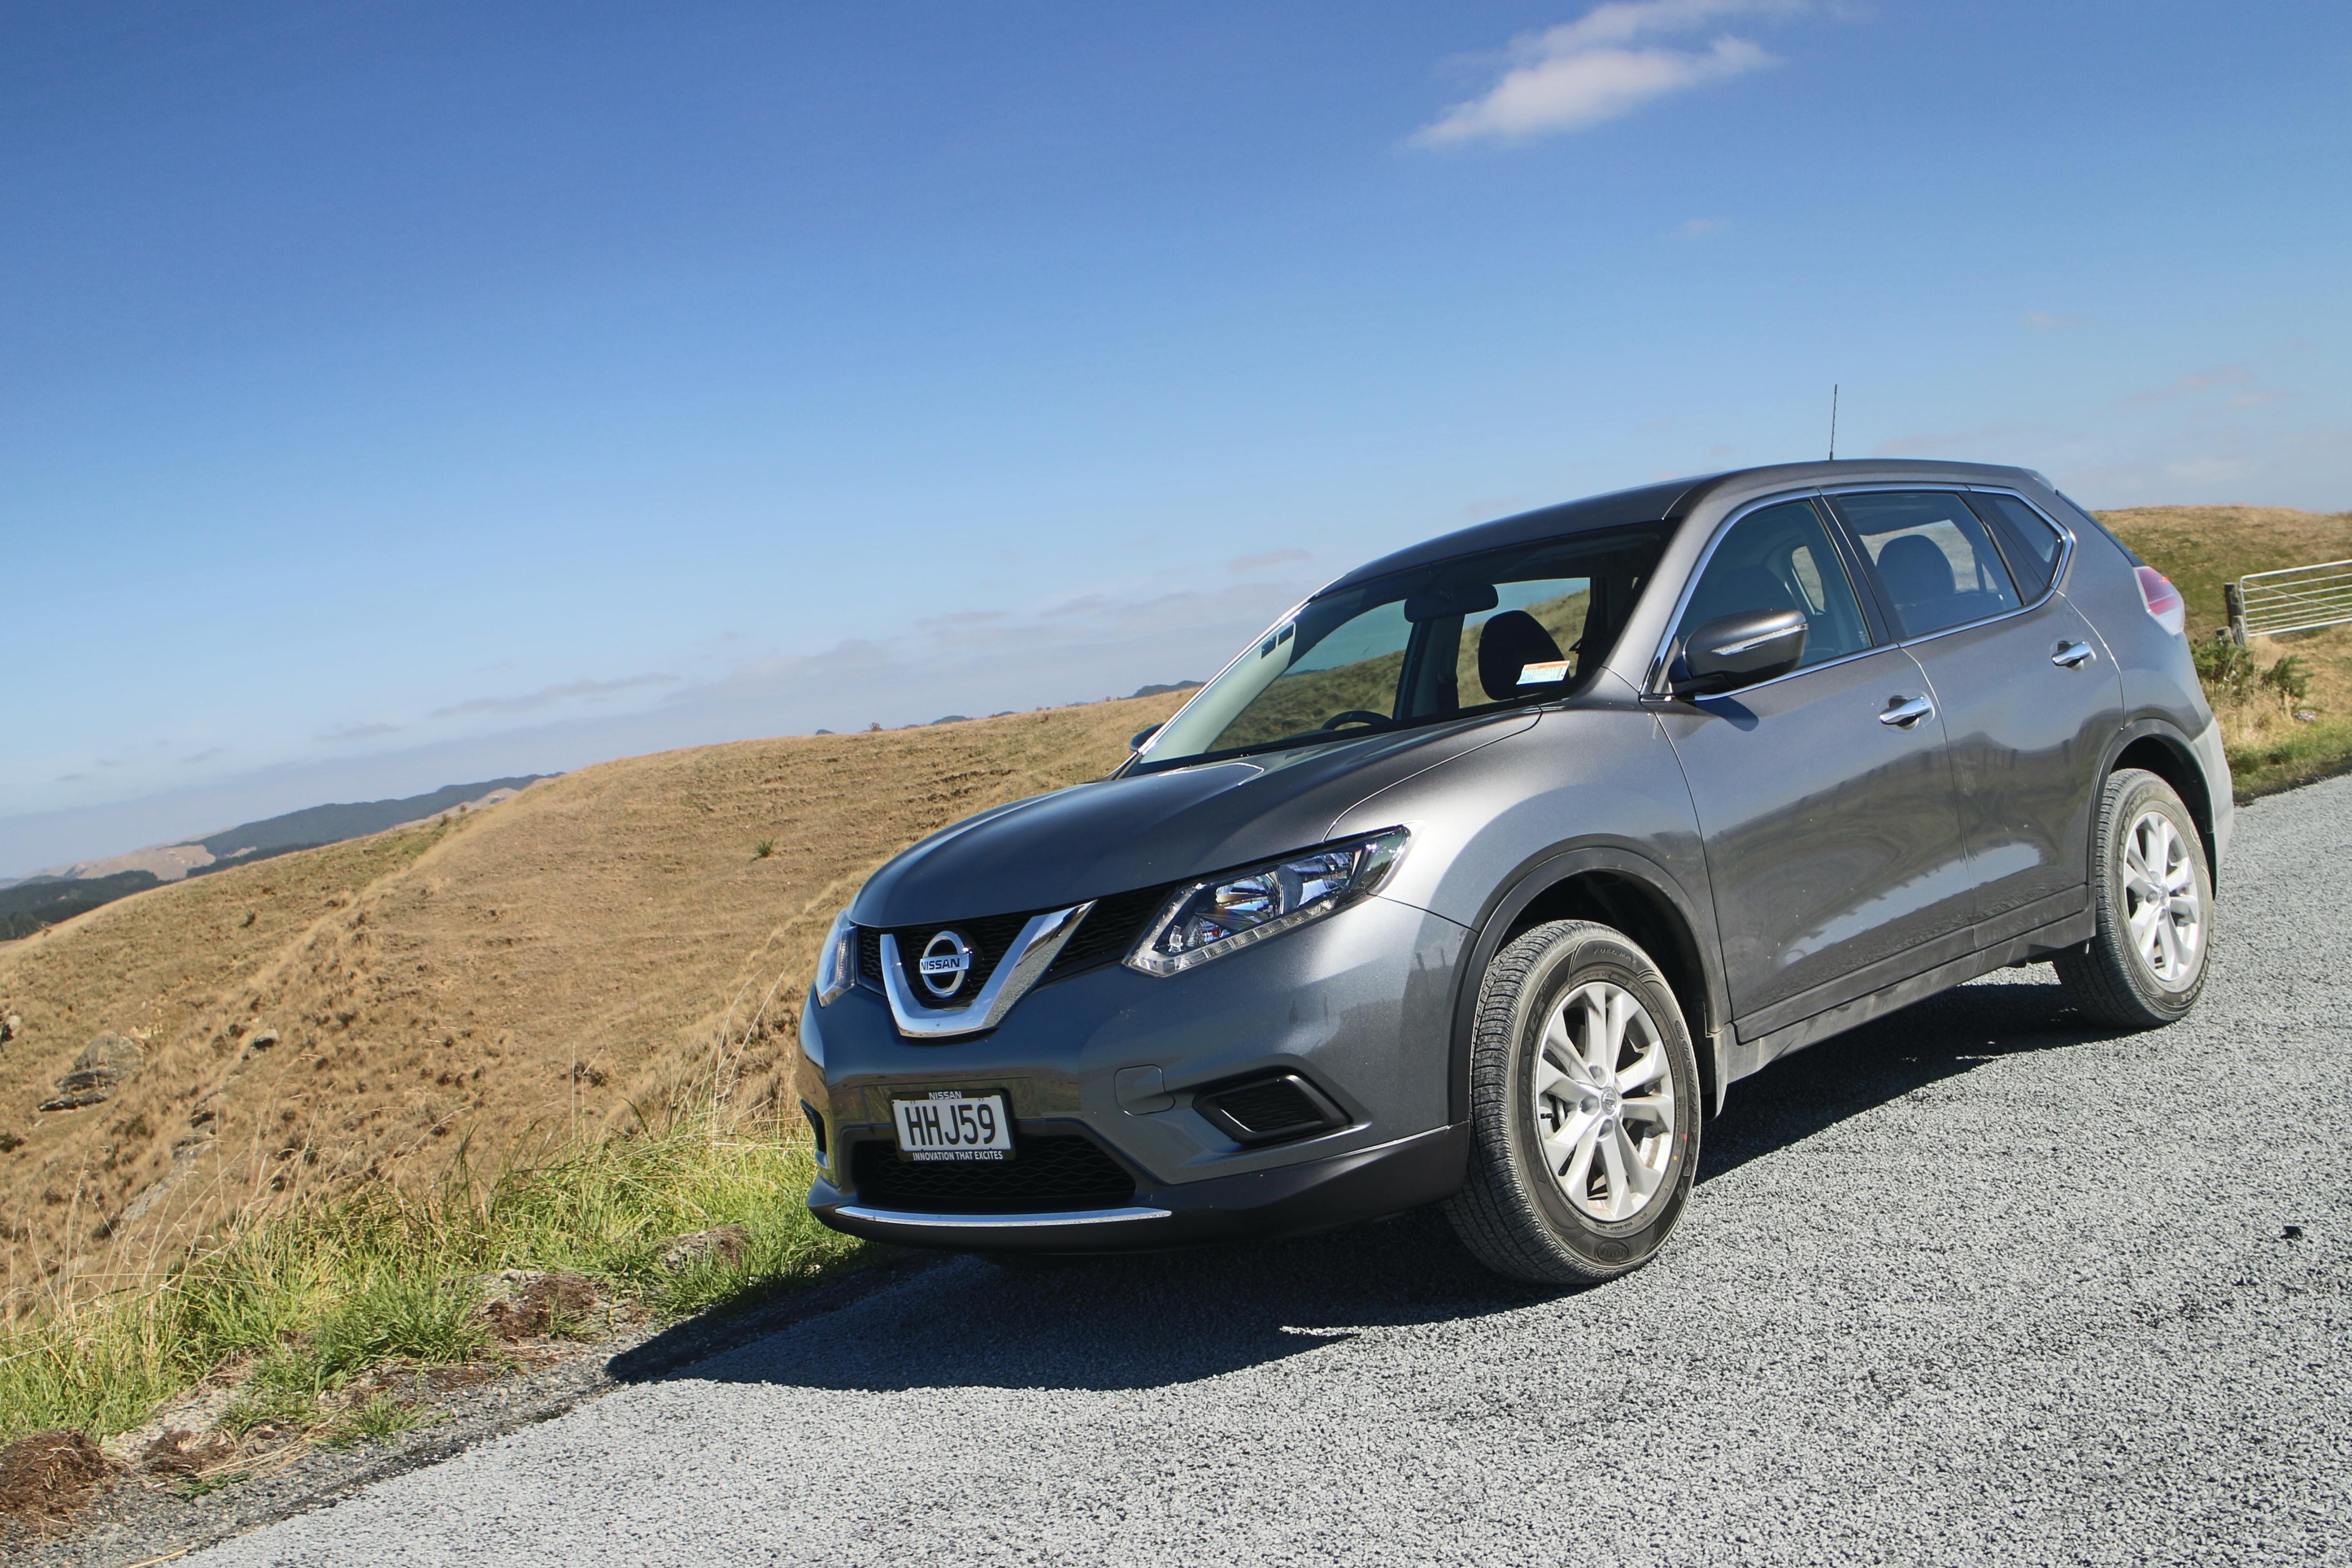 Nissan's new X-Trail ahead of the curve - NZ Herald